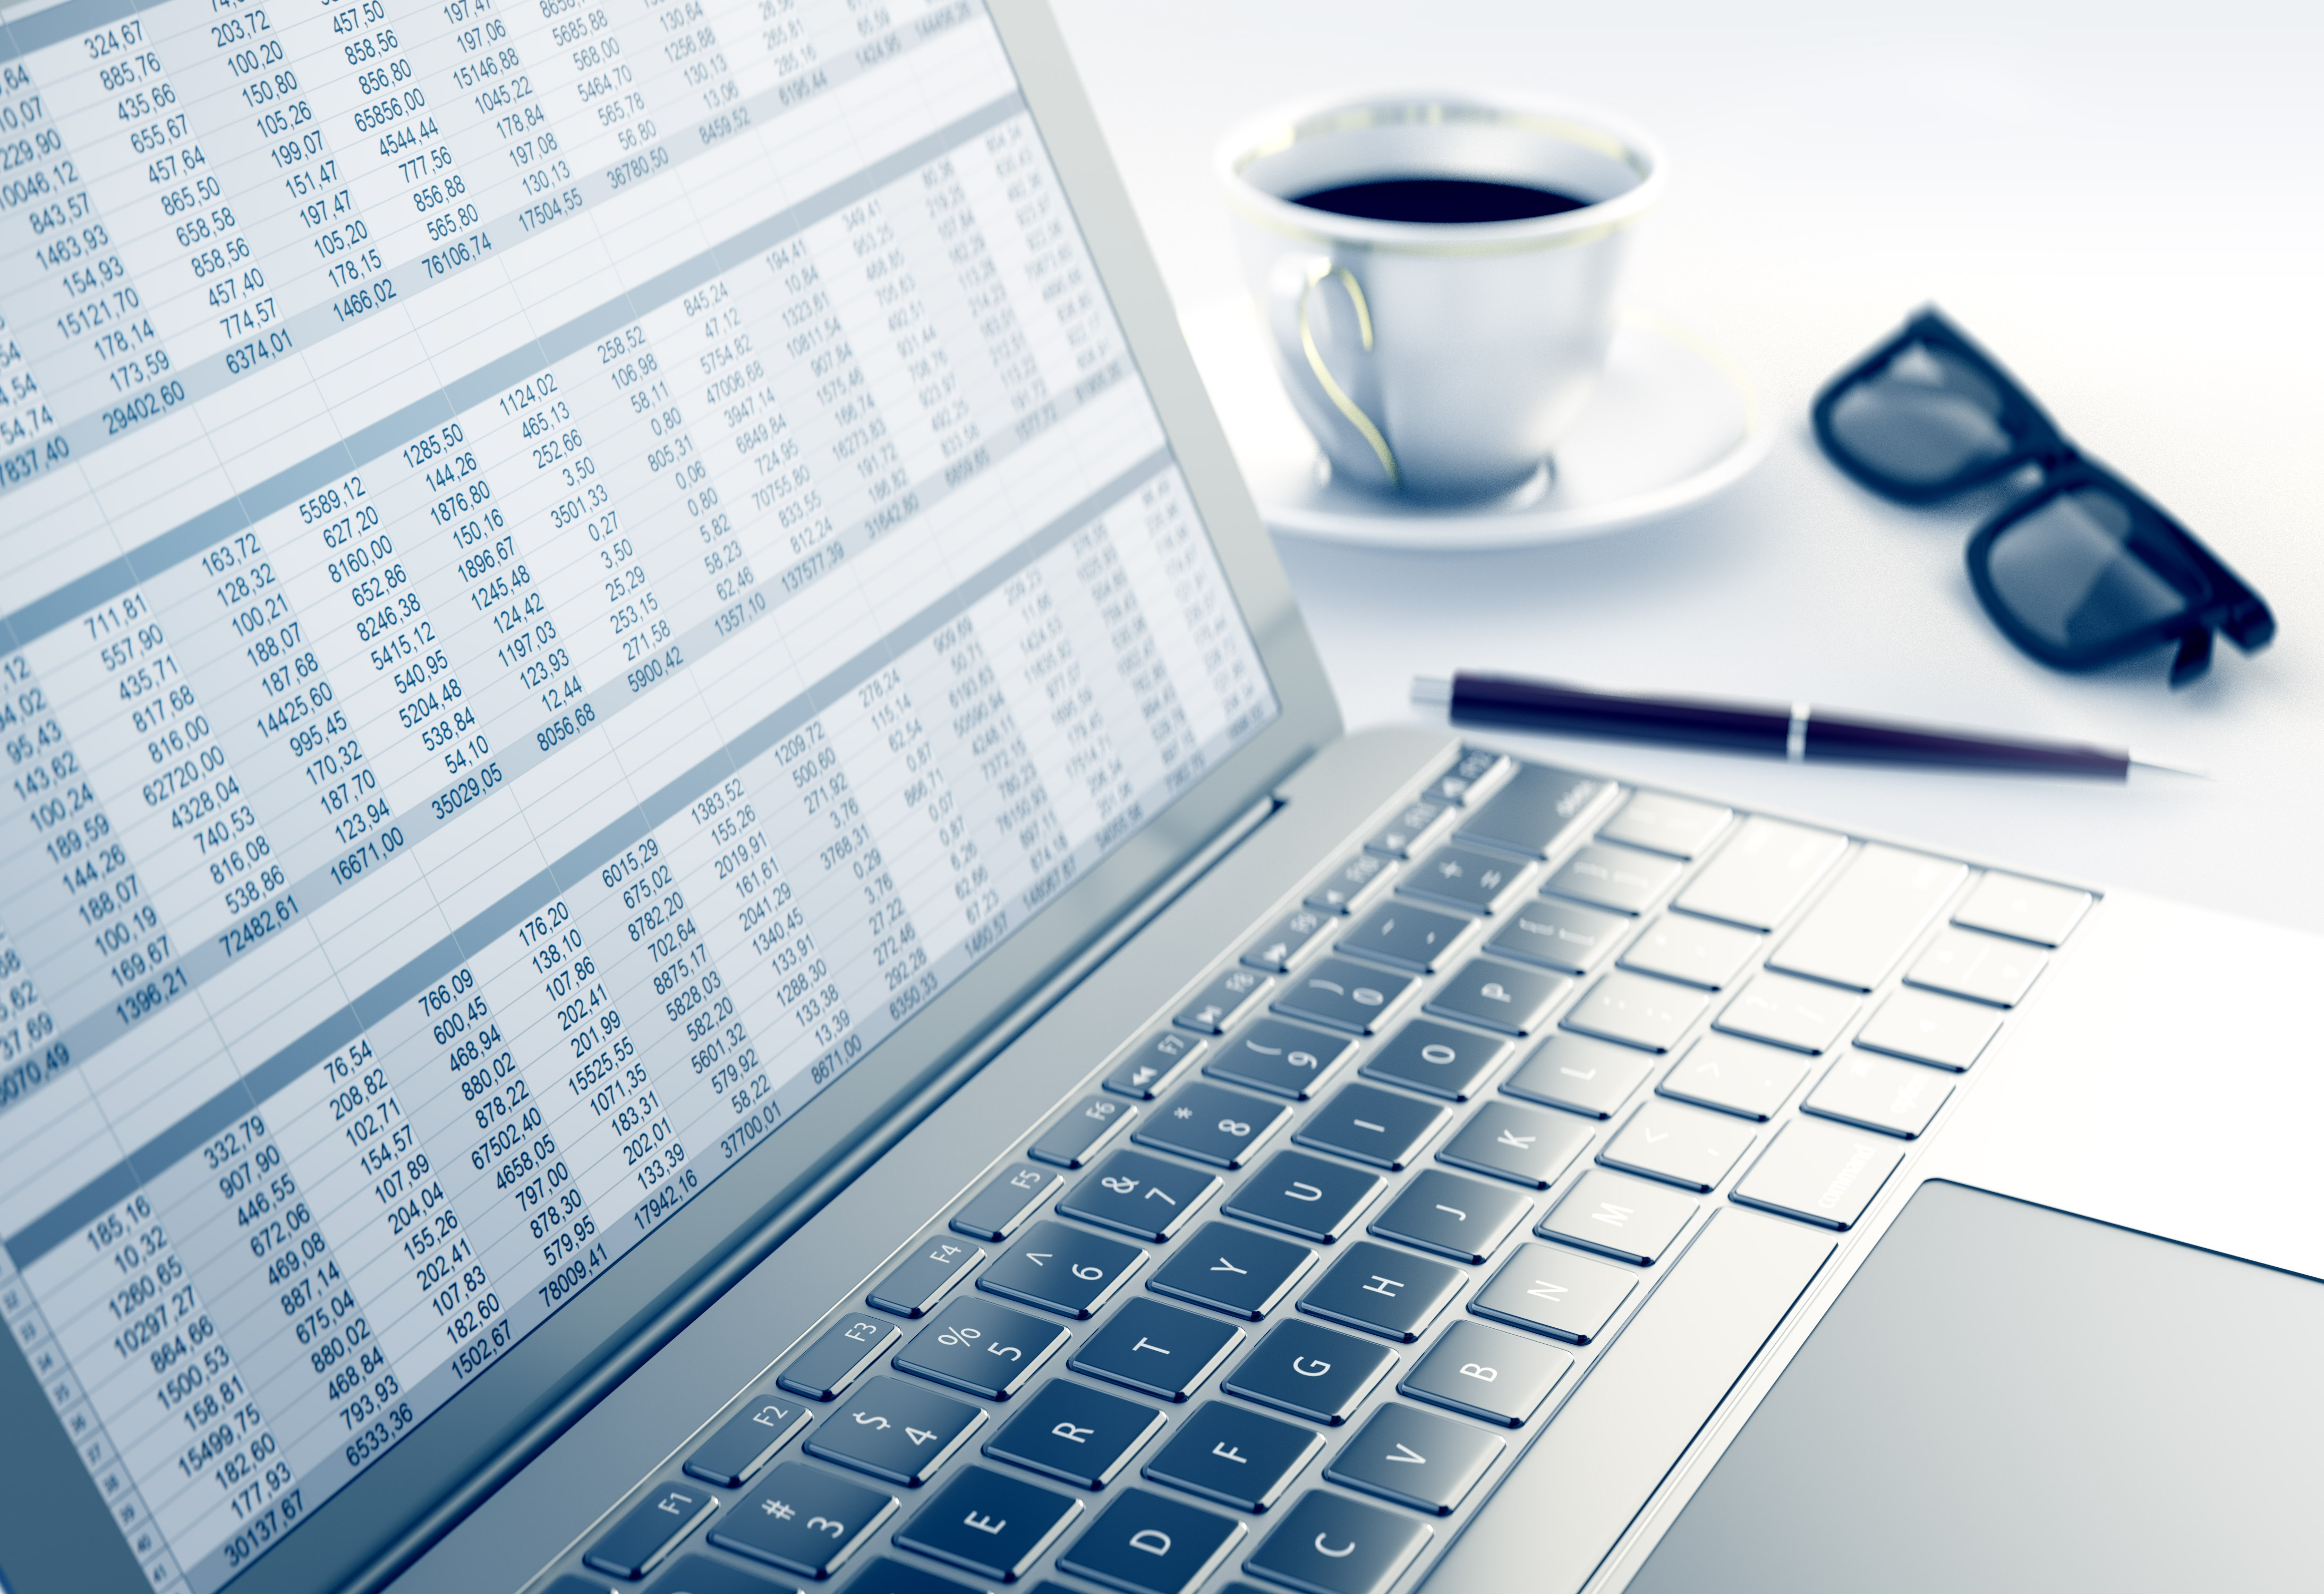 Spreadsheet-in-Laptop-476034794_4375x3000.jpeg